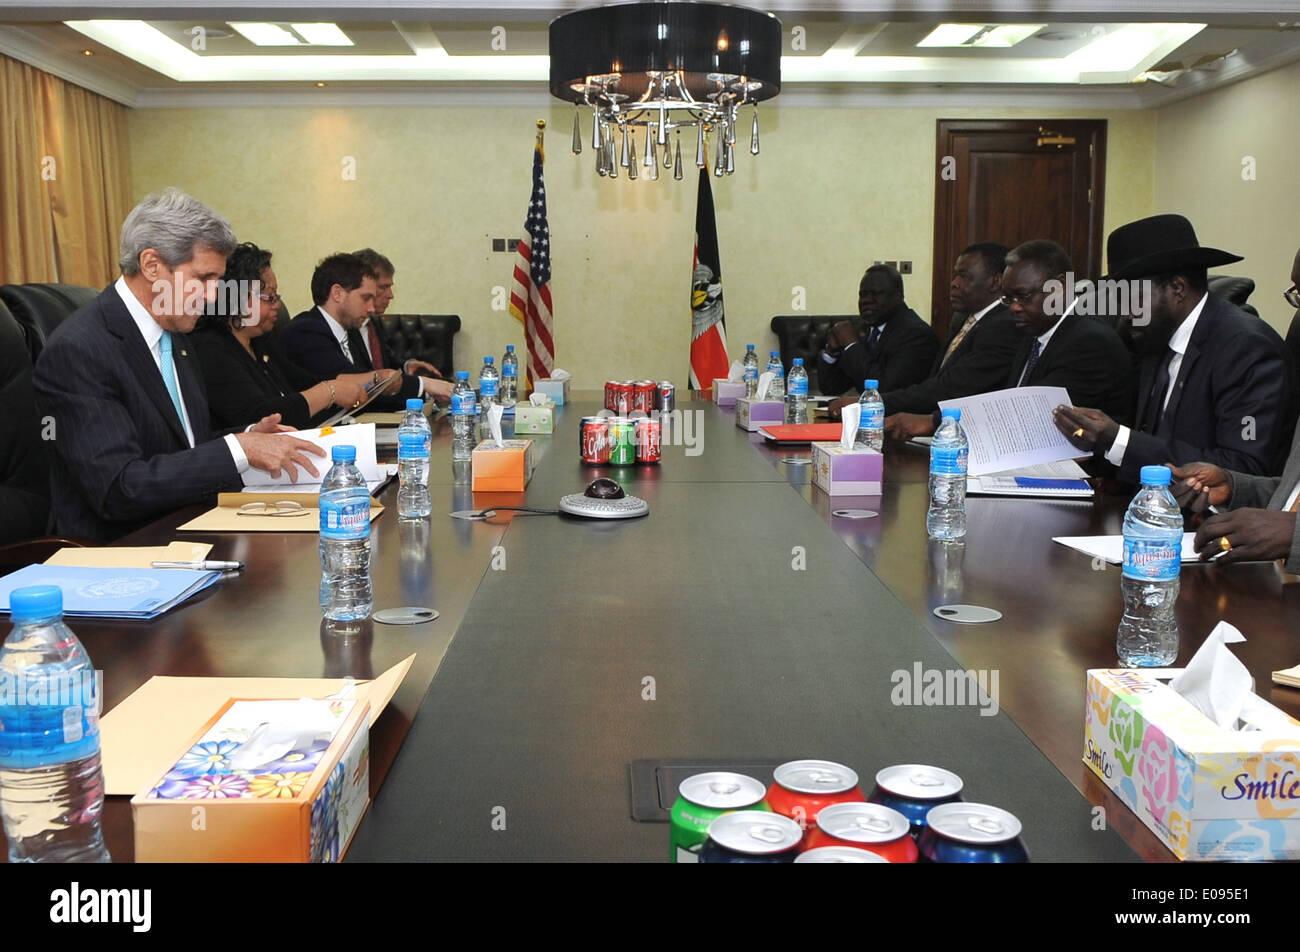 Secretary Kerry, South Sudanese President Kiir Prepare for Meeting in Juba - Stock Image